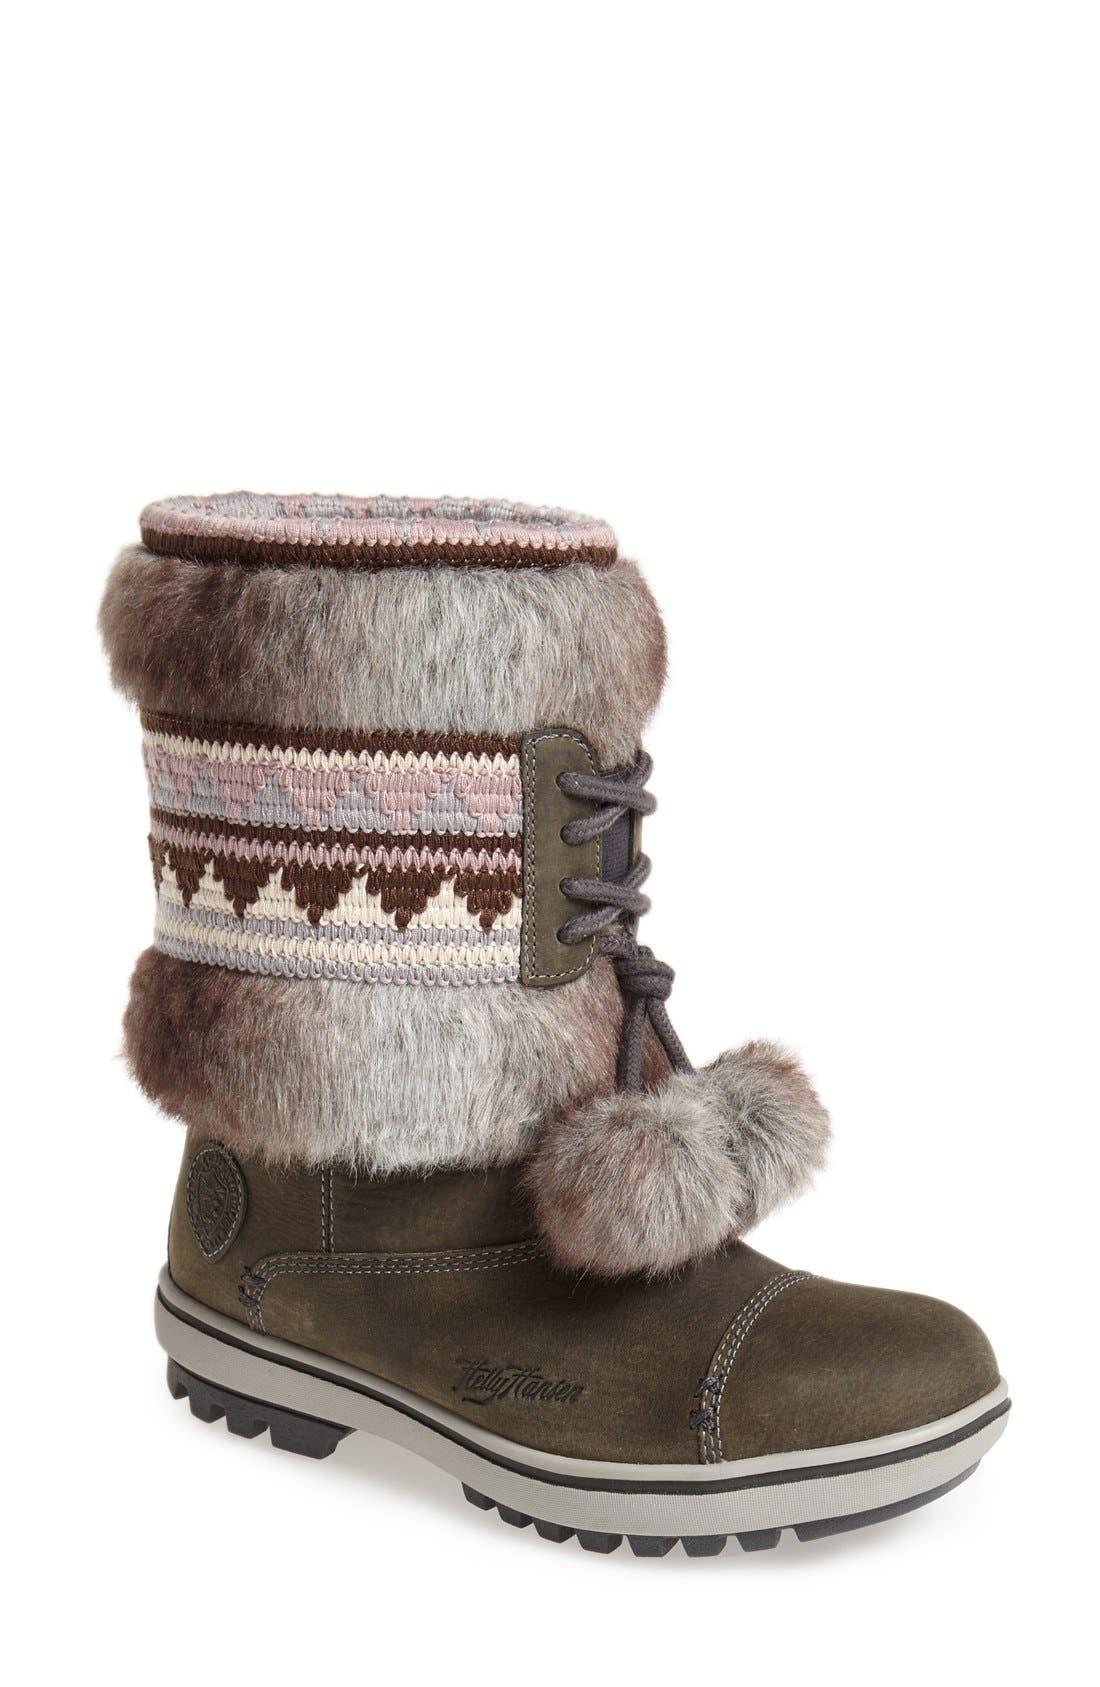 Main Image - Helly Hansen 'Iskoras' Waterproof Leather Snow Boot (Women)